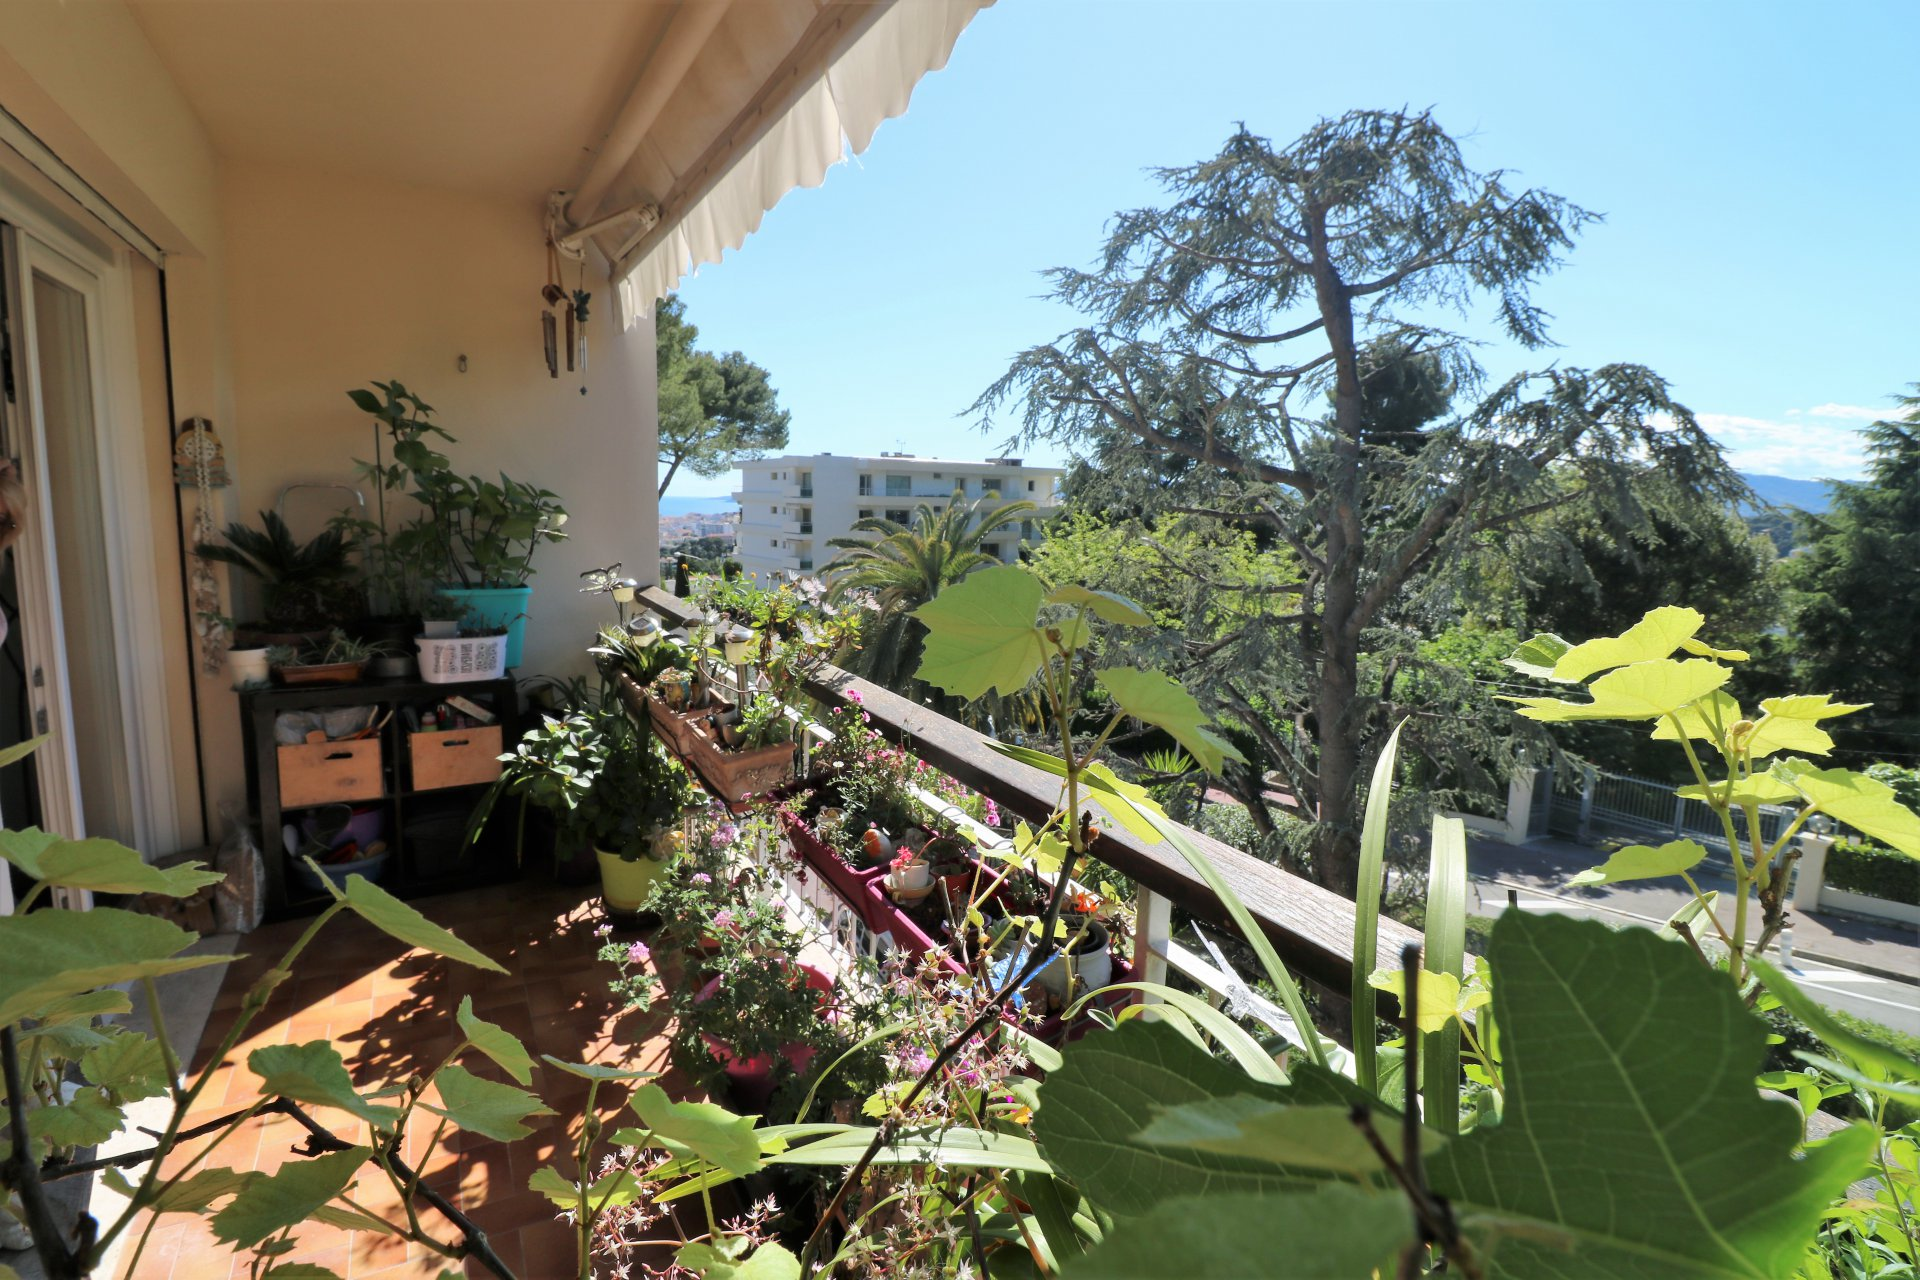 Le Cannet - 2-room top floor whith terrace